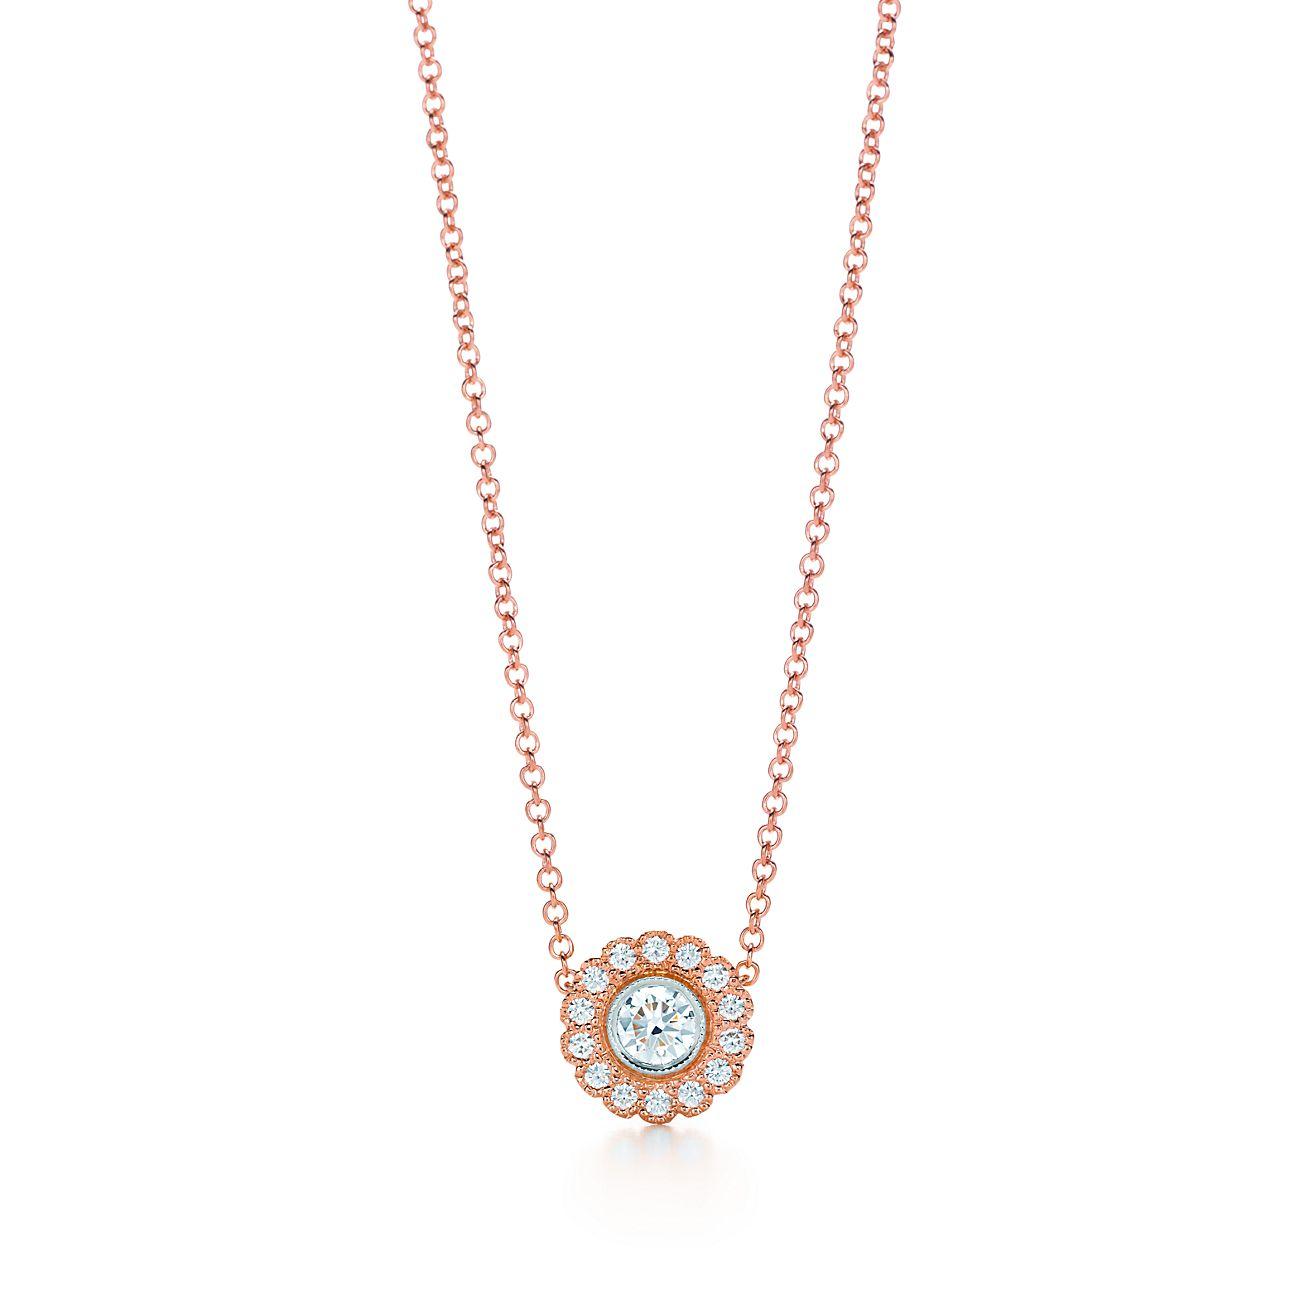 Tiffany & Co. Estate 18k Triple Diamond Necklace grBKh